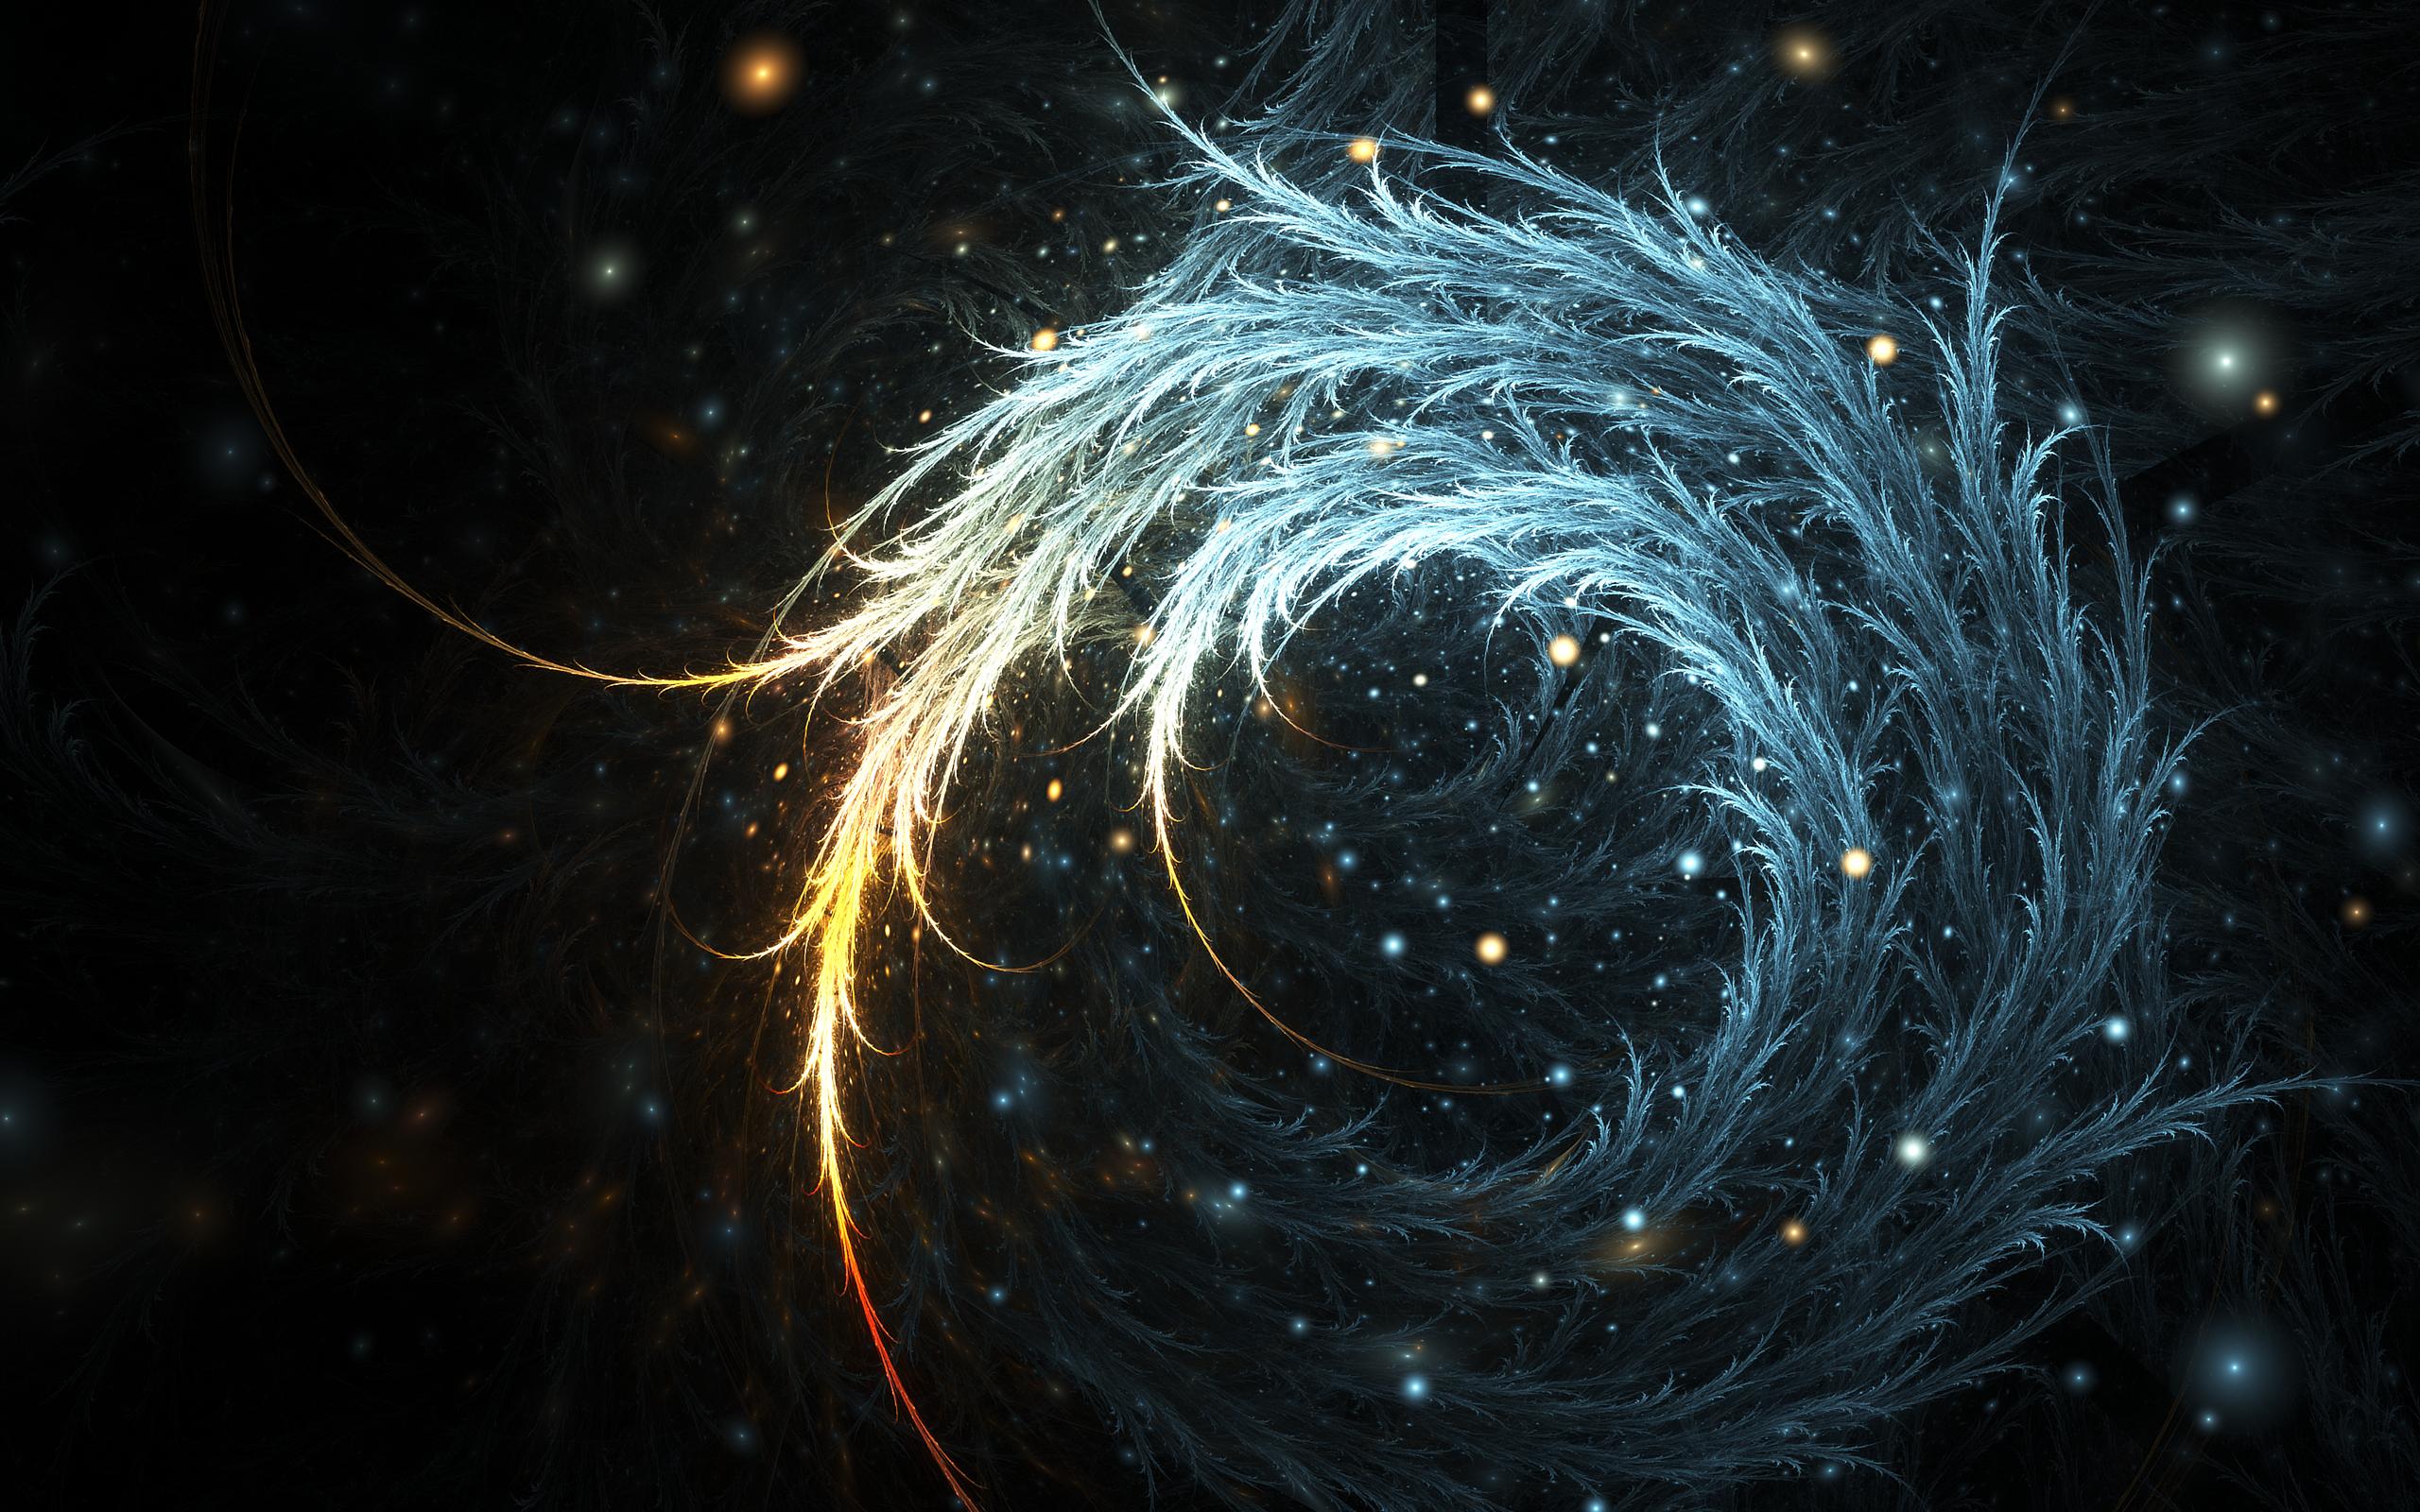 Swirling feathers wallpaper